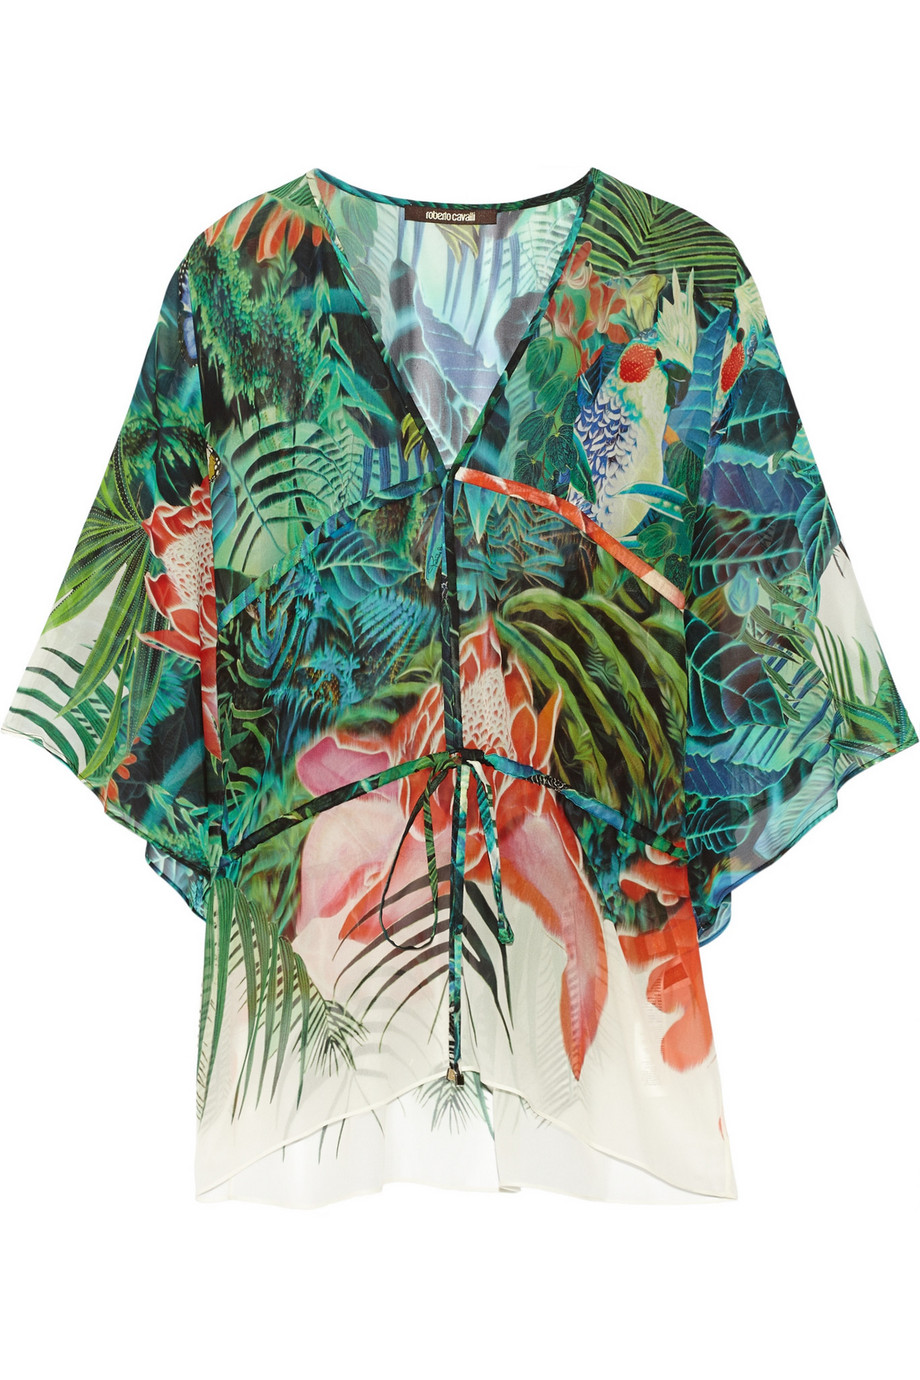 Roberto Cavalli Printed Silk-Georgette Kaftan, Green, Women's, Size: 40